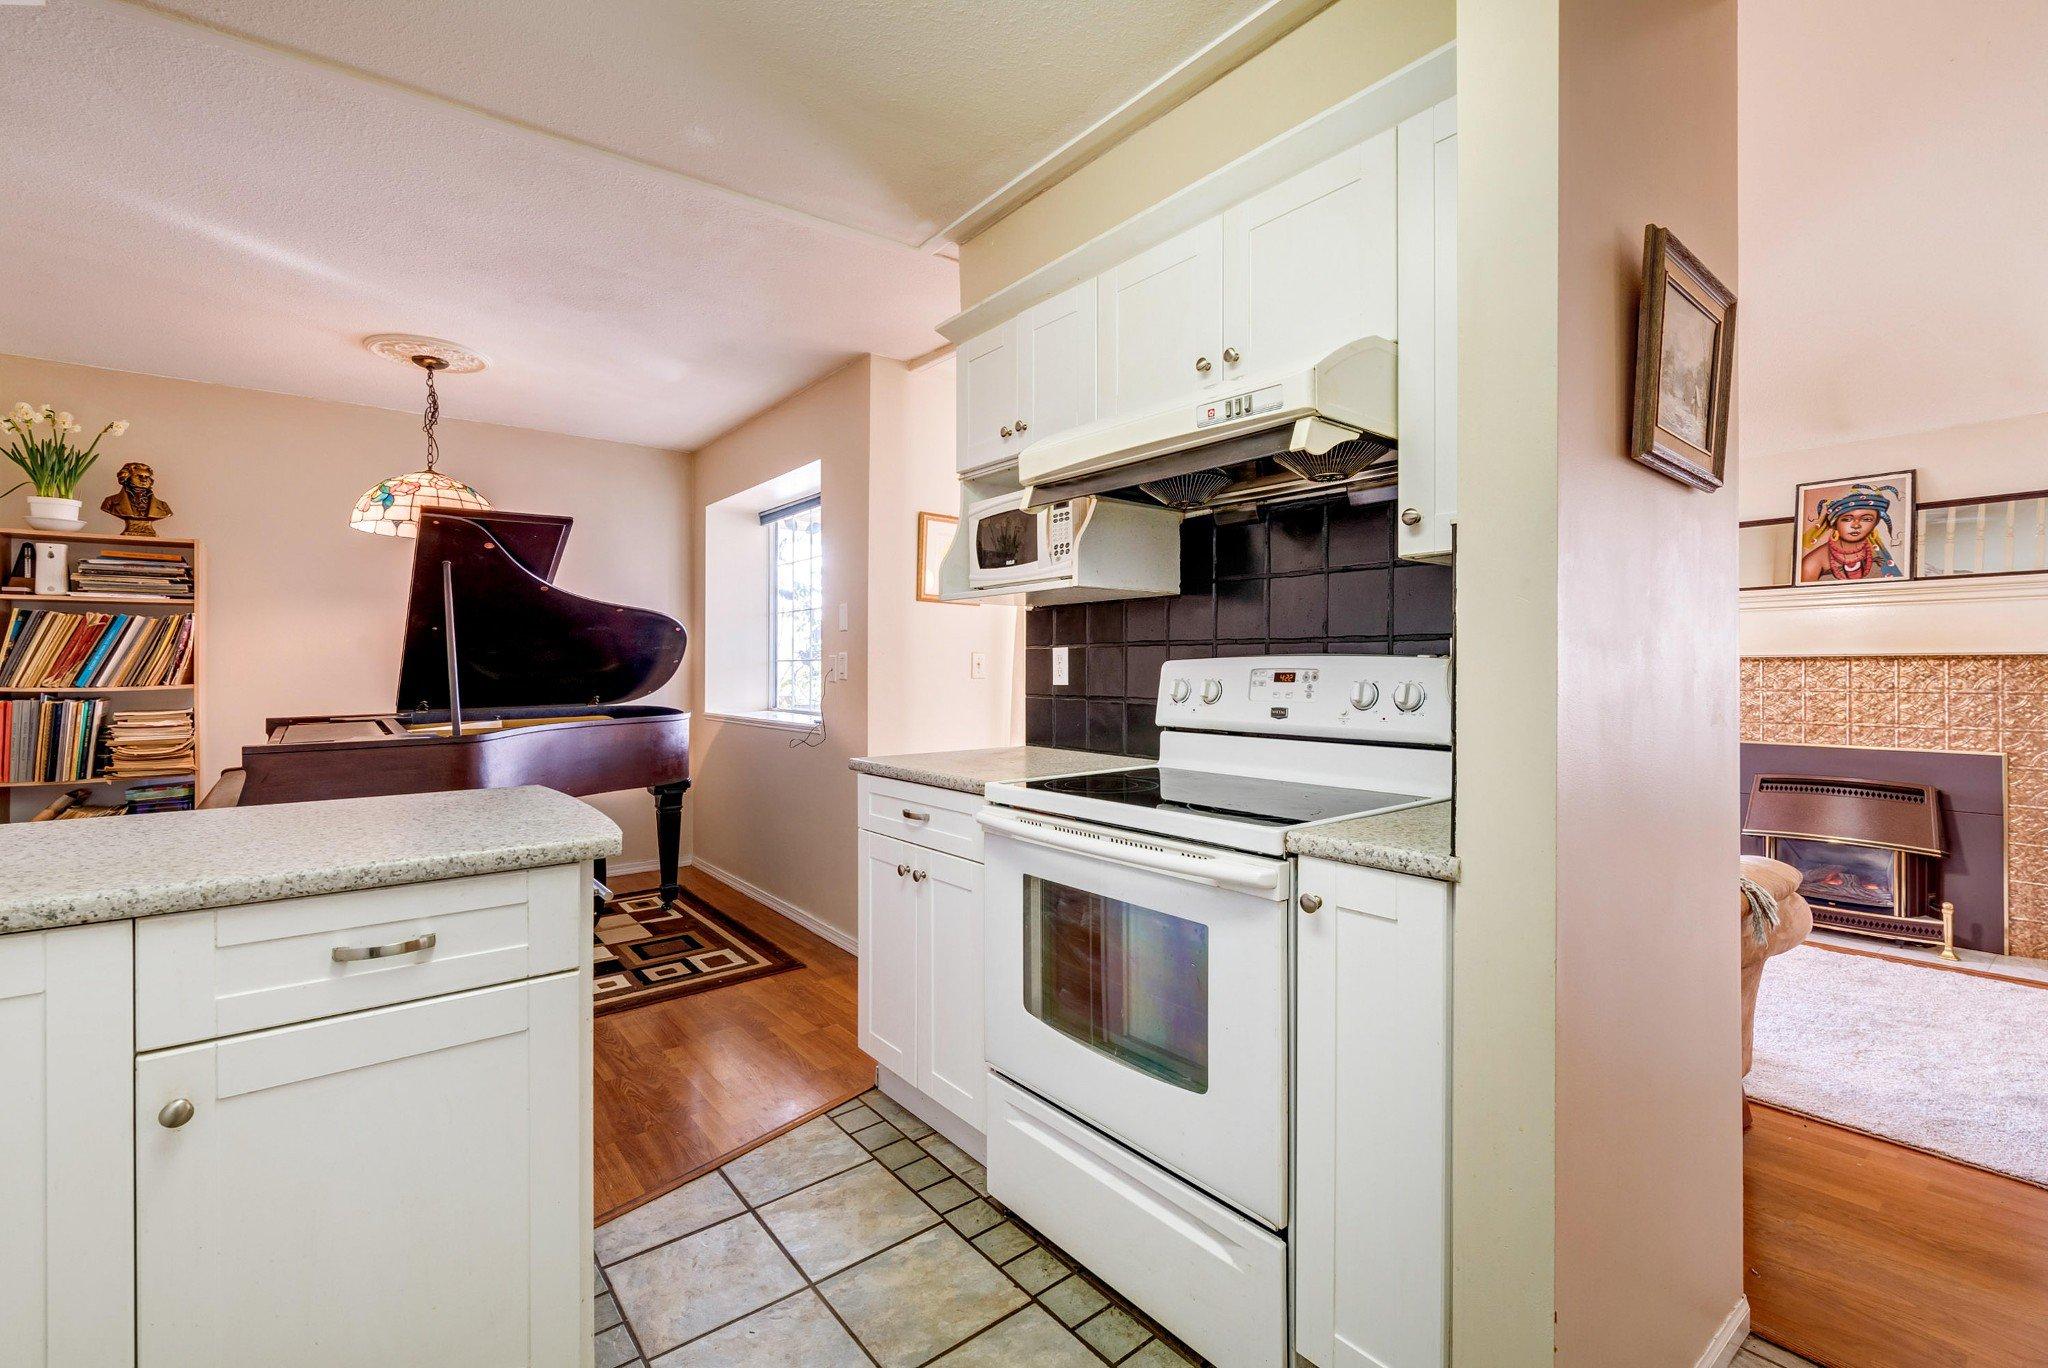 Photo 13: Photos: 203 11578 225 STREET in Maple Ridge: Condo for sale : MLS®# R2447700